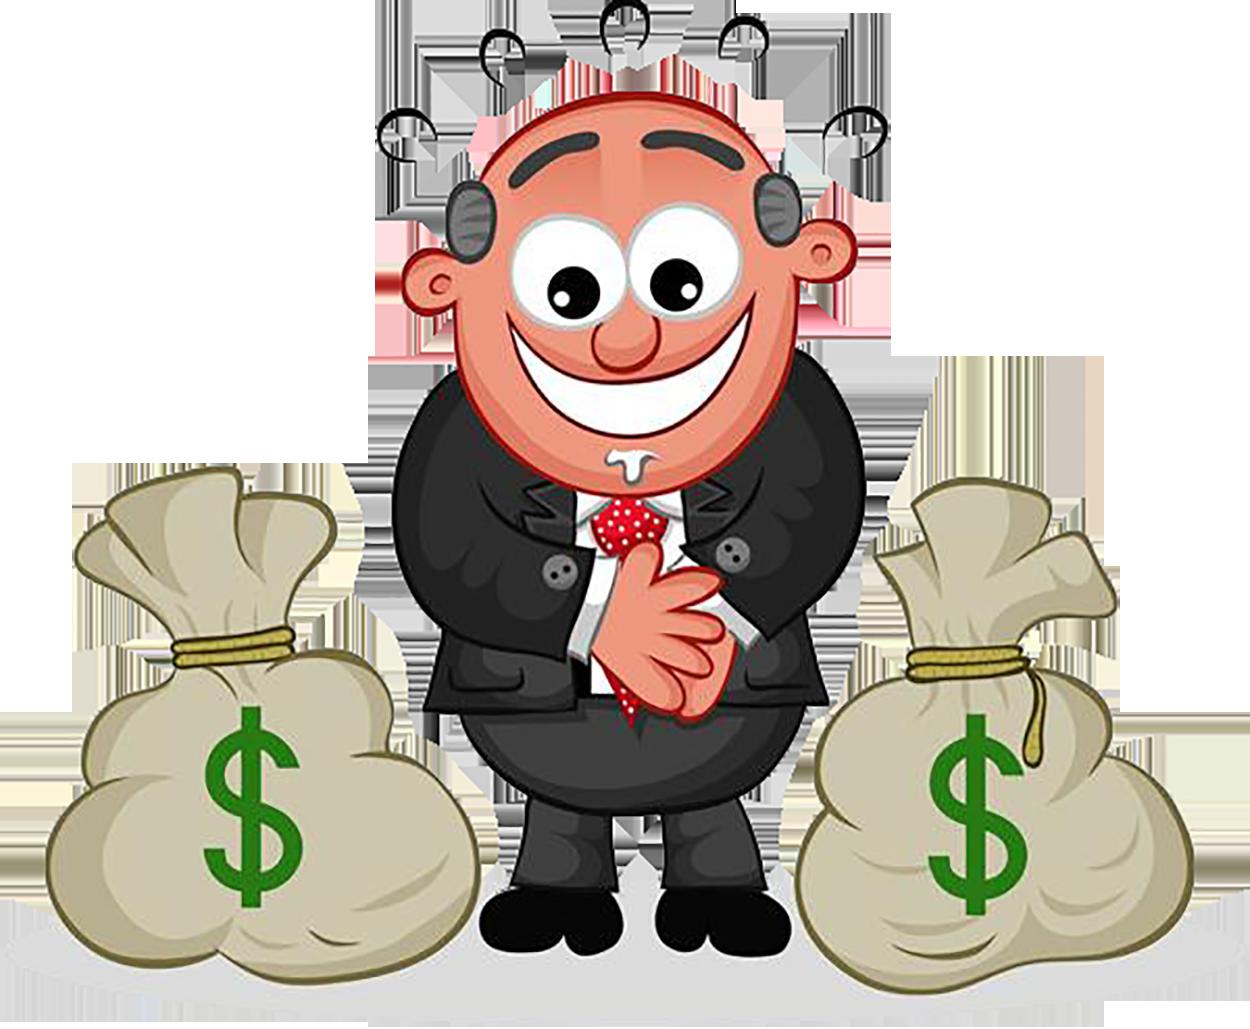 Human money clipart clip art black and white Cartoon Clip art - greedy man 1250*1029 transprent Png Free Download ... clip art black and white